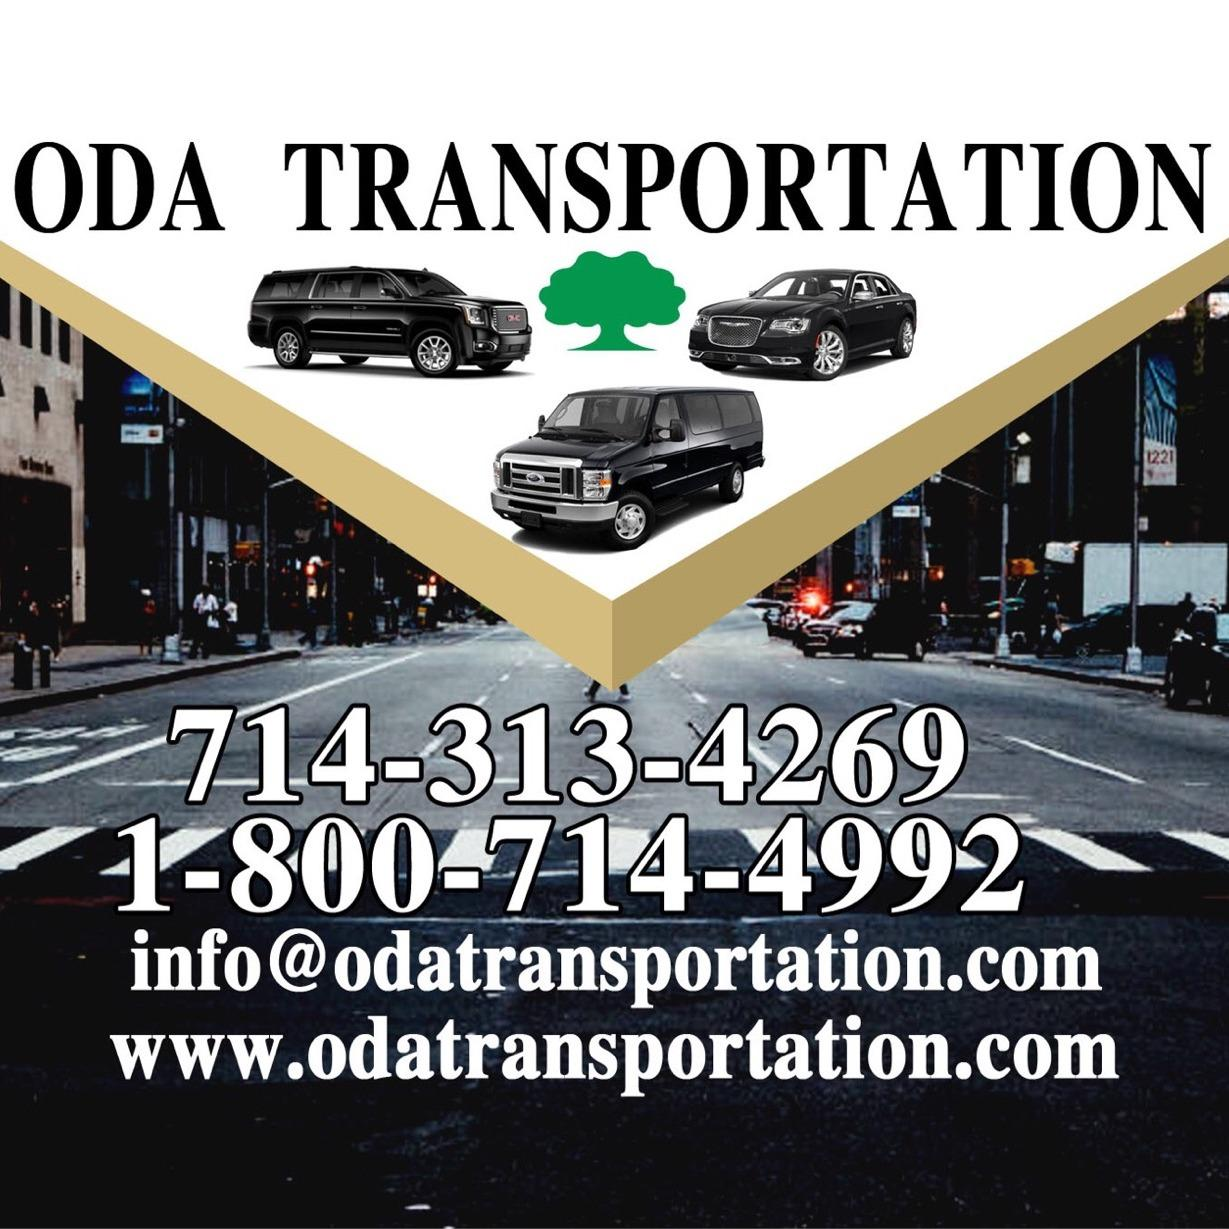 Oda Transportation Town Car Service